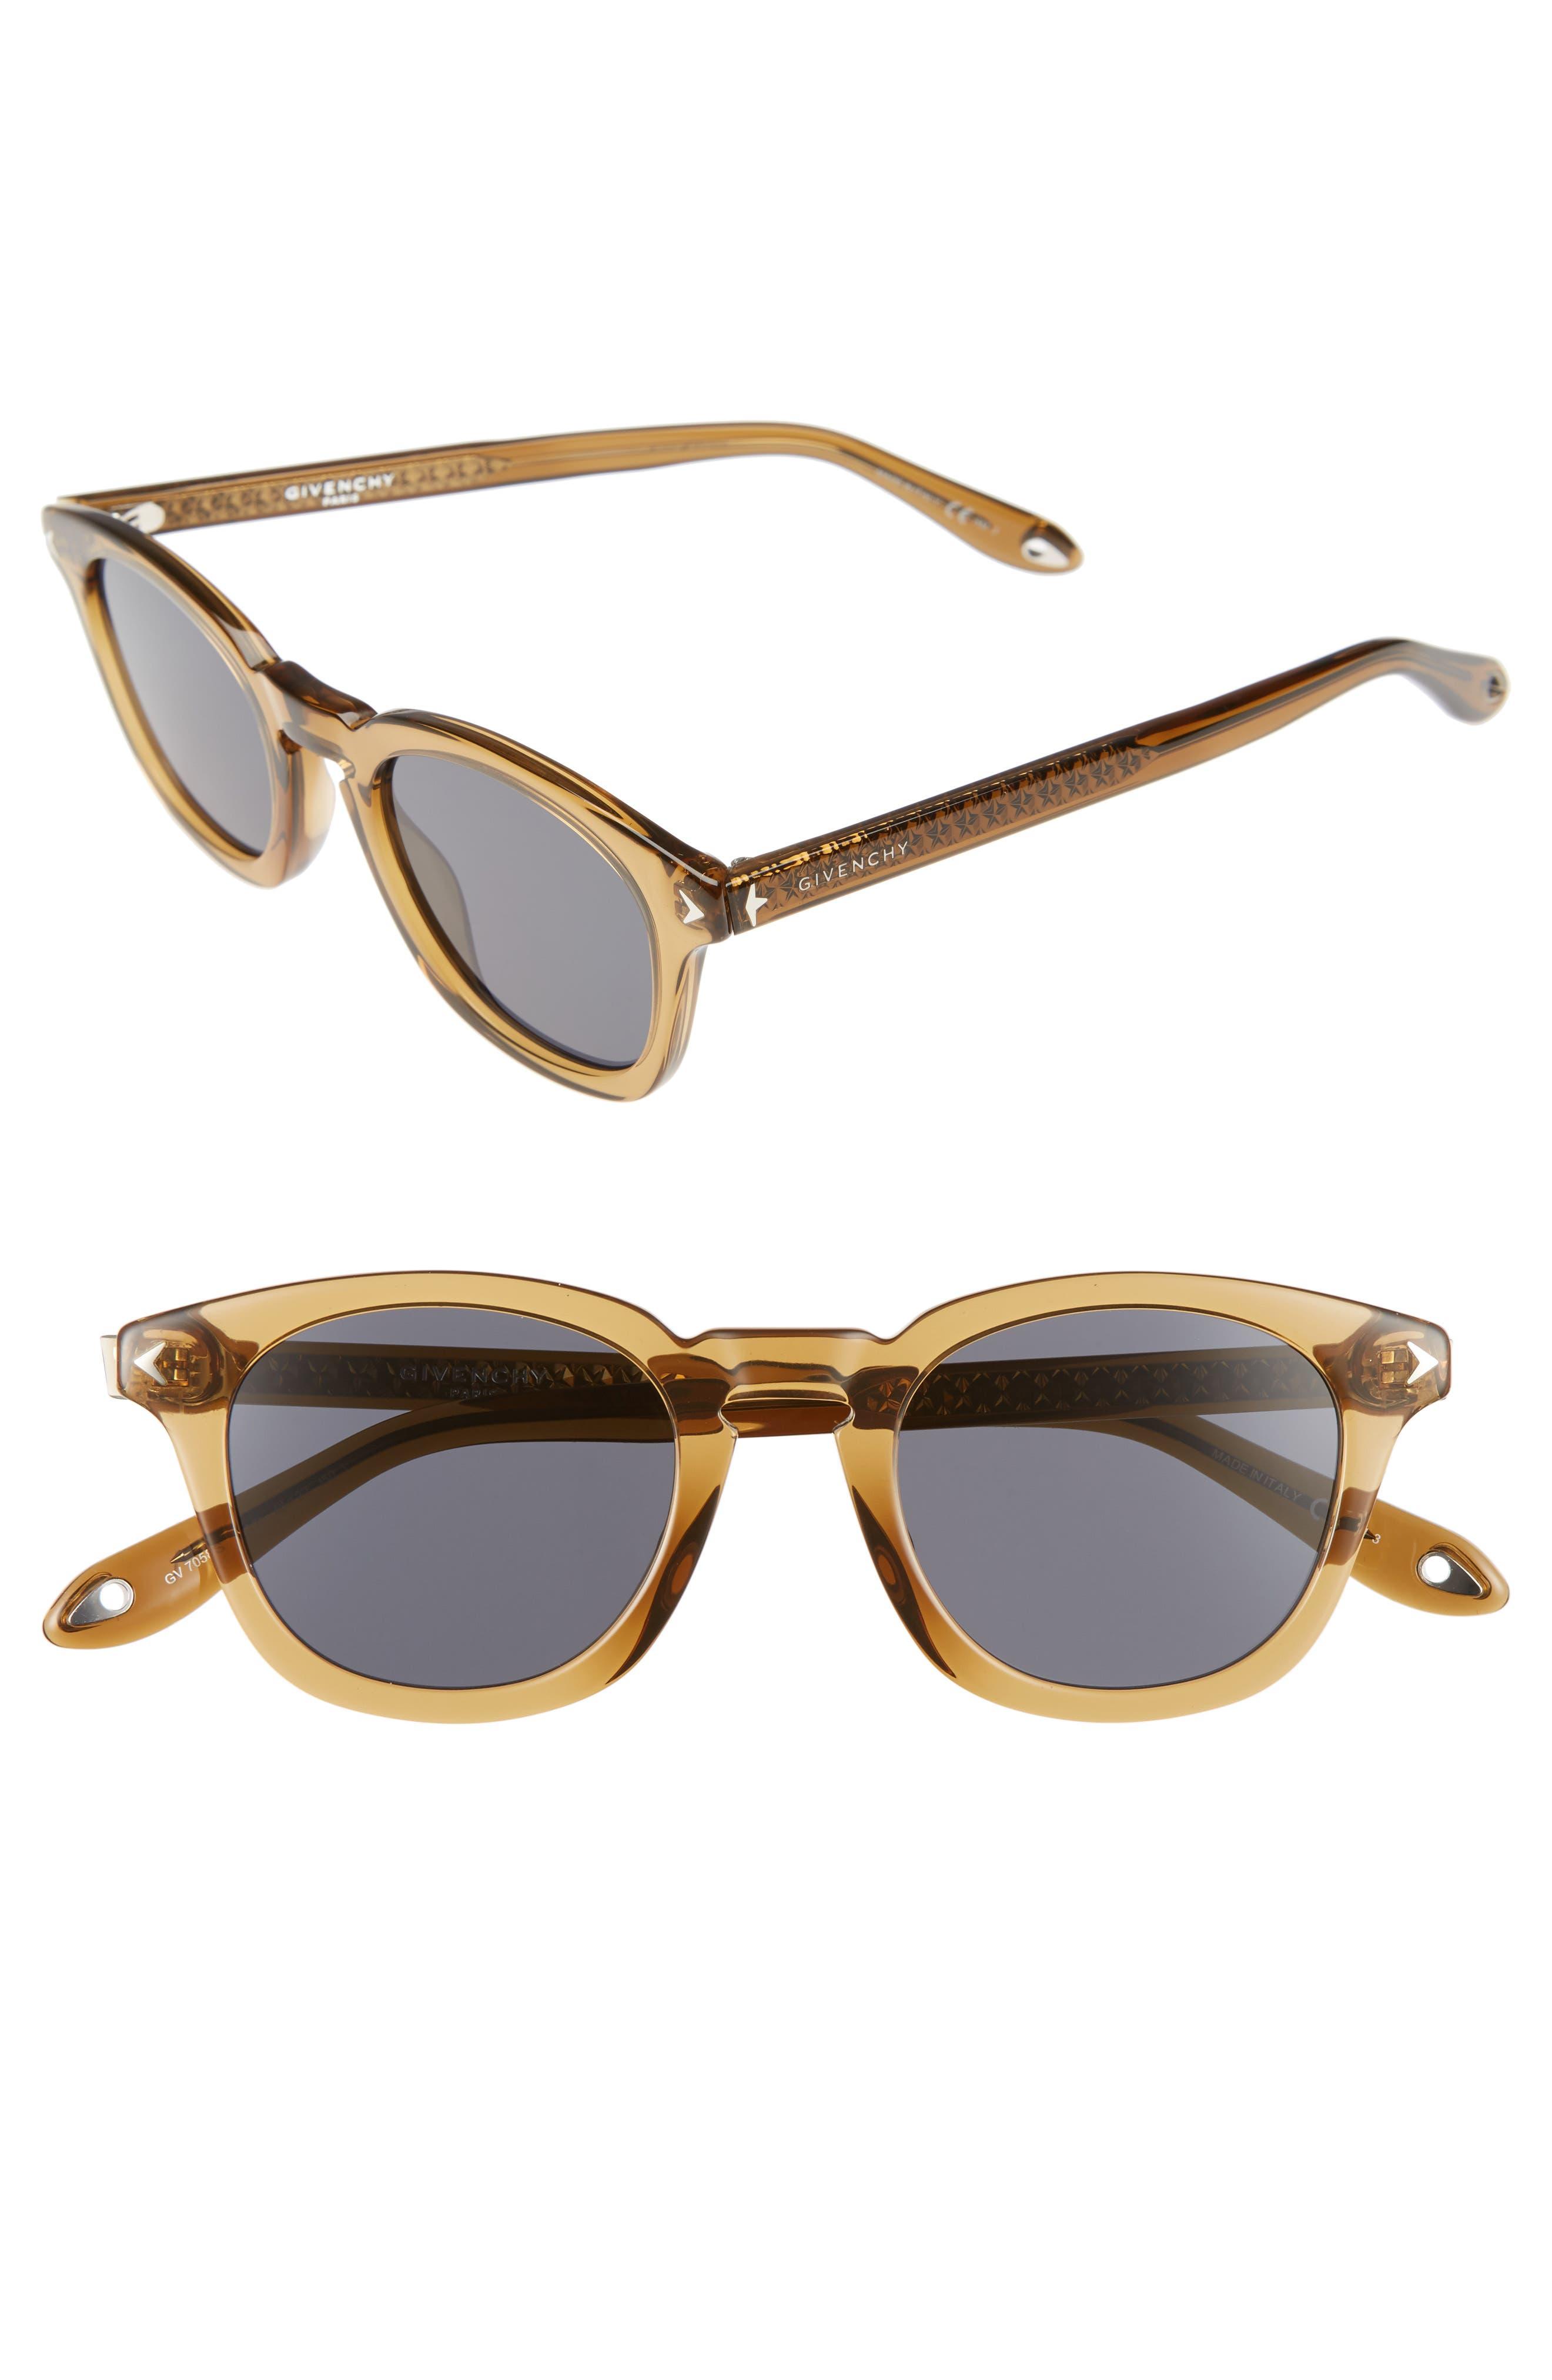 48mm Polarized Sunglasses,                             Main thumbnail 1, color,                             Beige